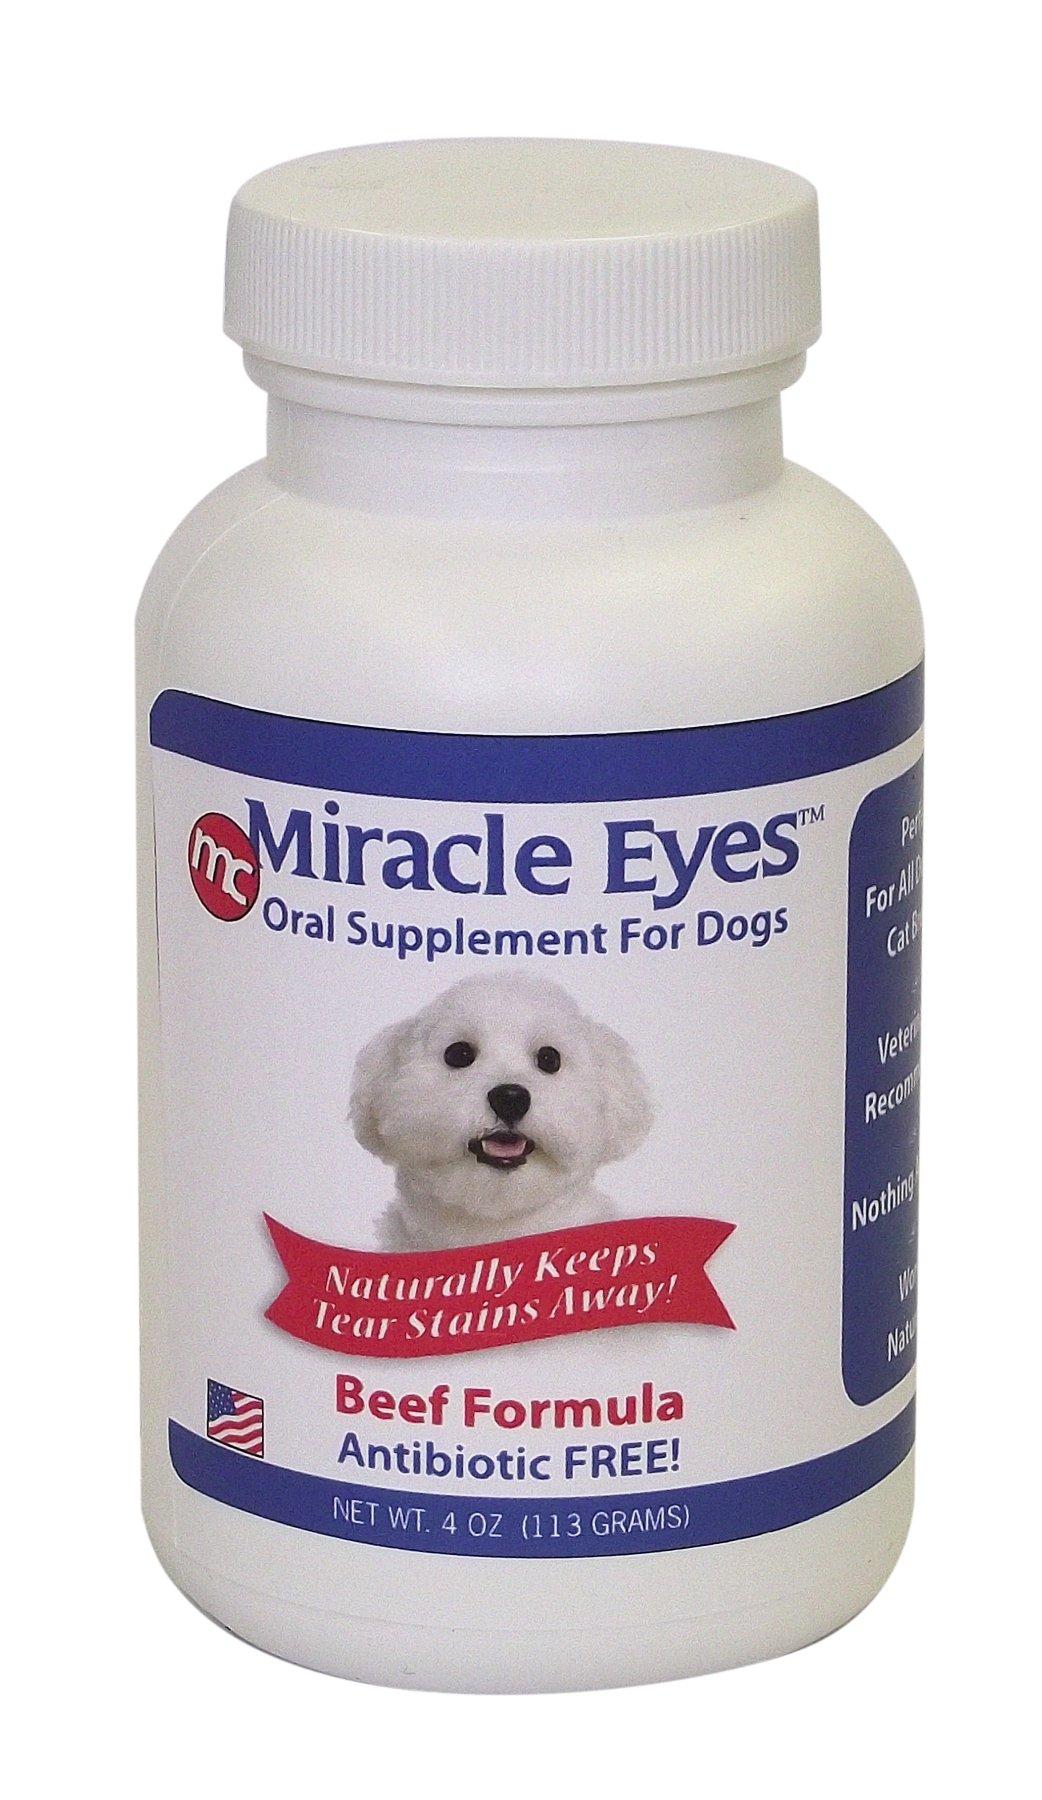 GIMBORN 731024 Miracle Eyes Beef Formula for Pets 4 oz